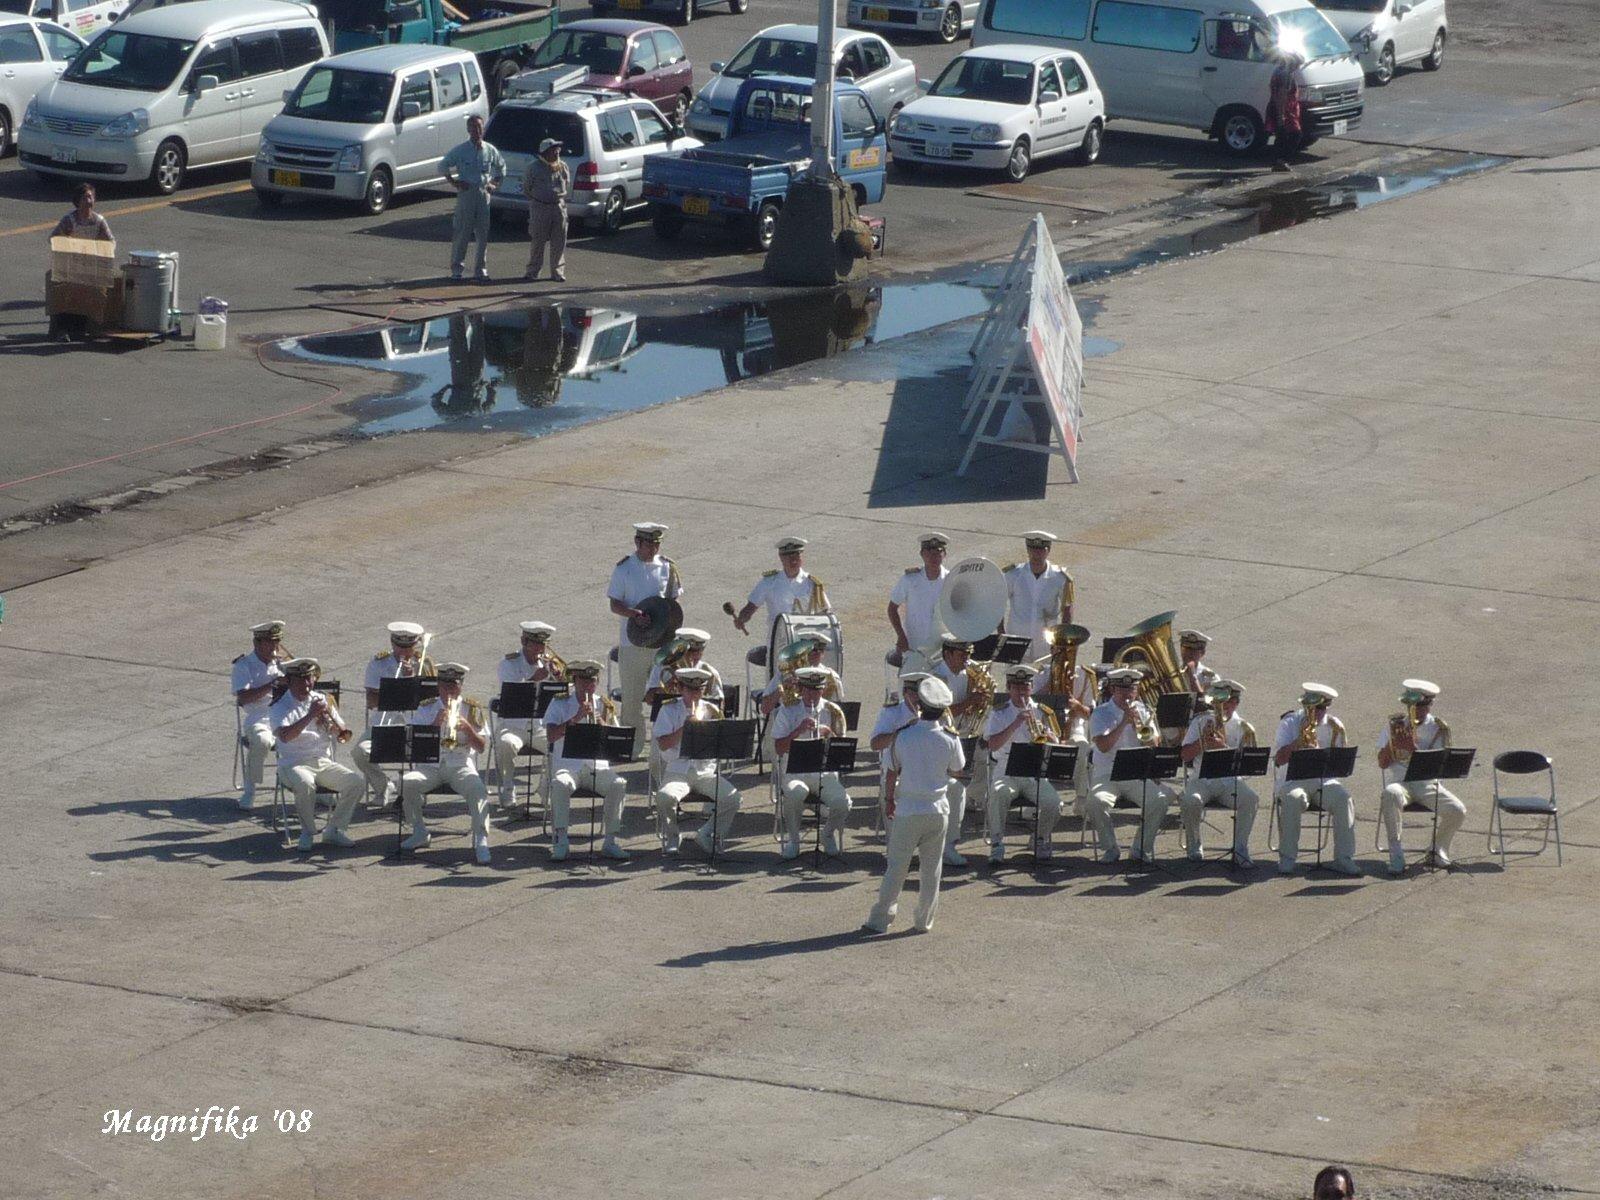 ASUKA II 竿灯・ねぶた祭りクルーズ japanese festival cruise-3_e0140365_20211933.jpg